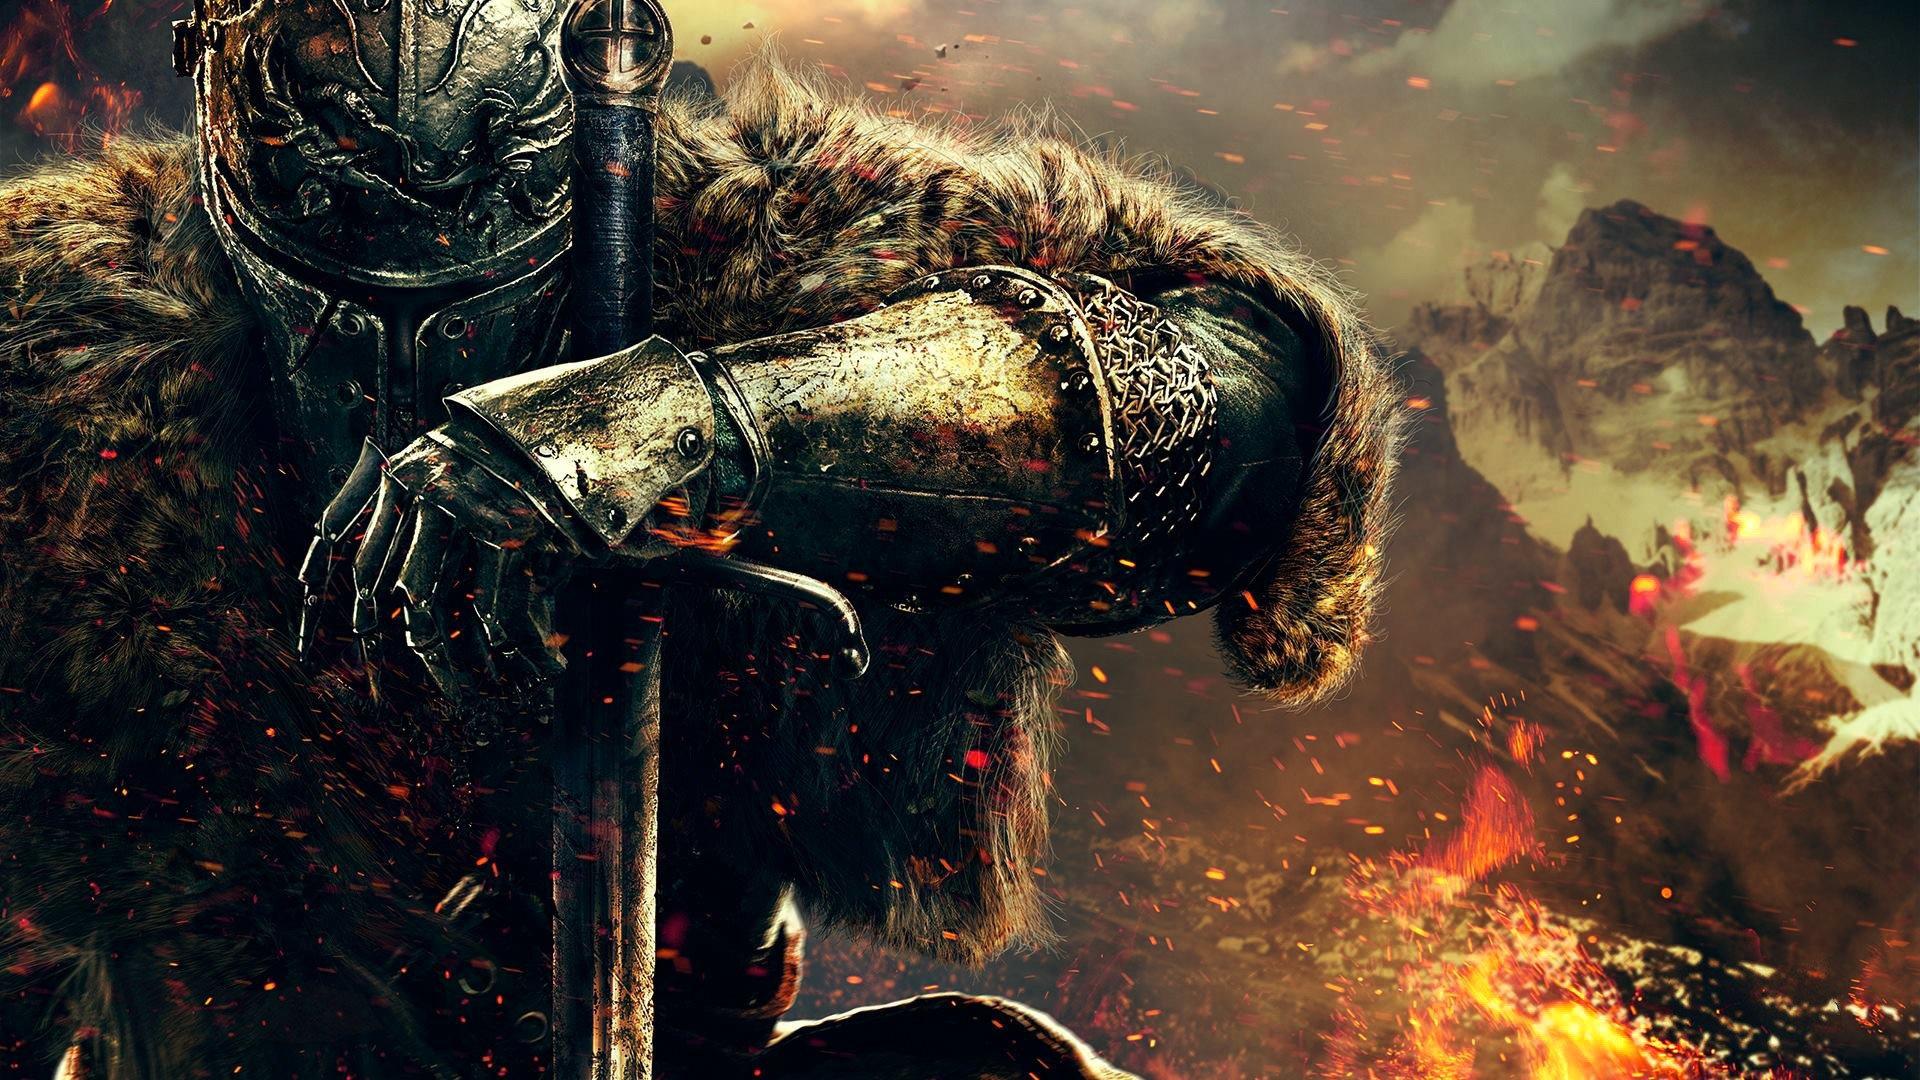 54 Dark Souls II HD Wallpapers   Backgrounds - Wallpaper Abyss